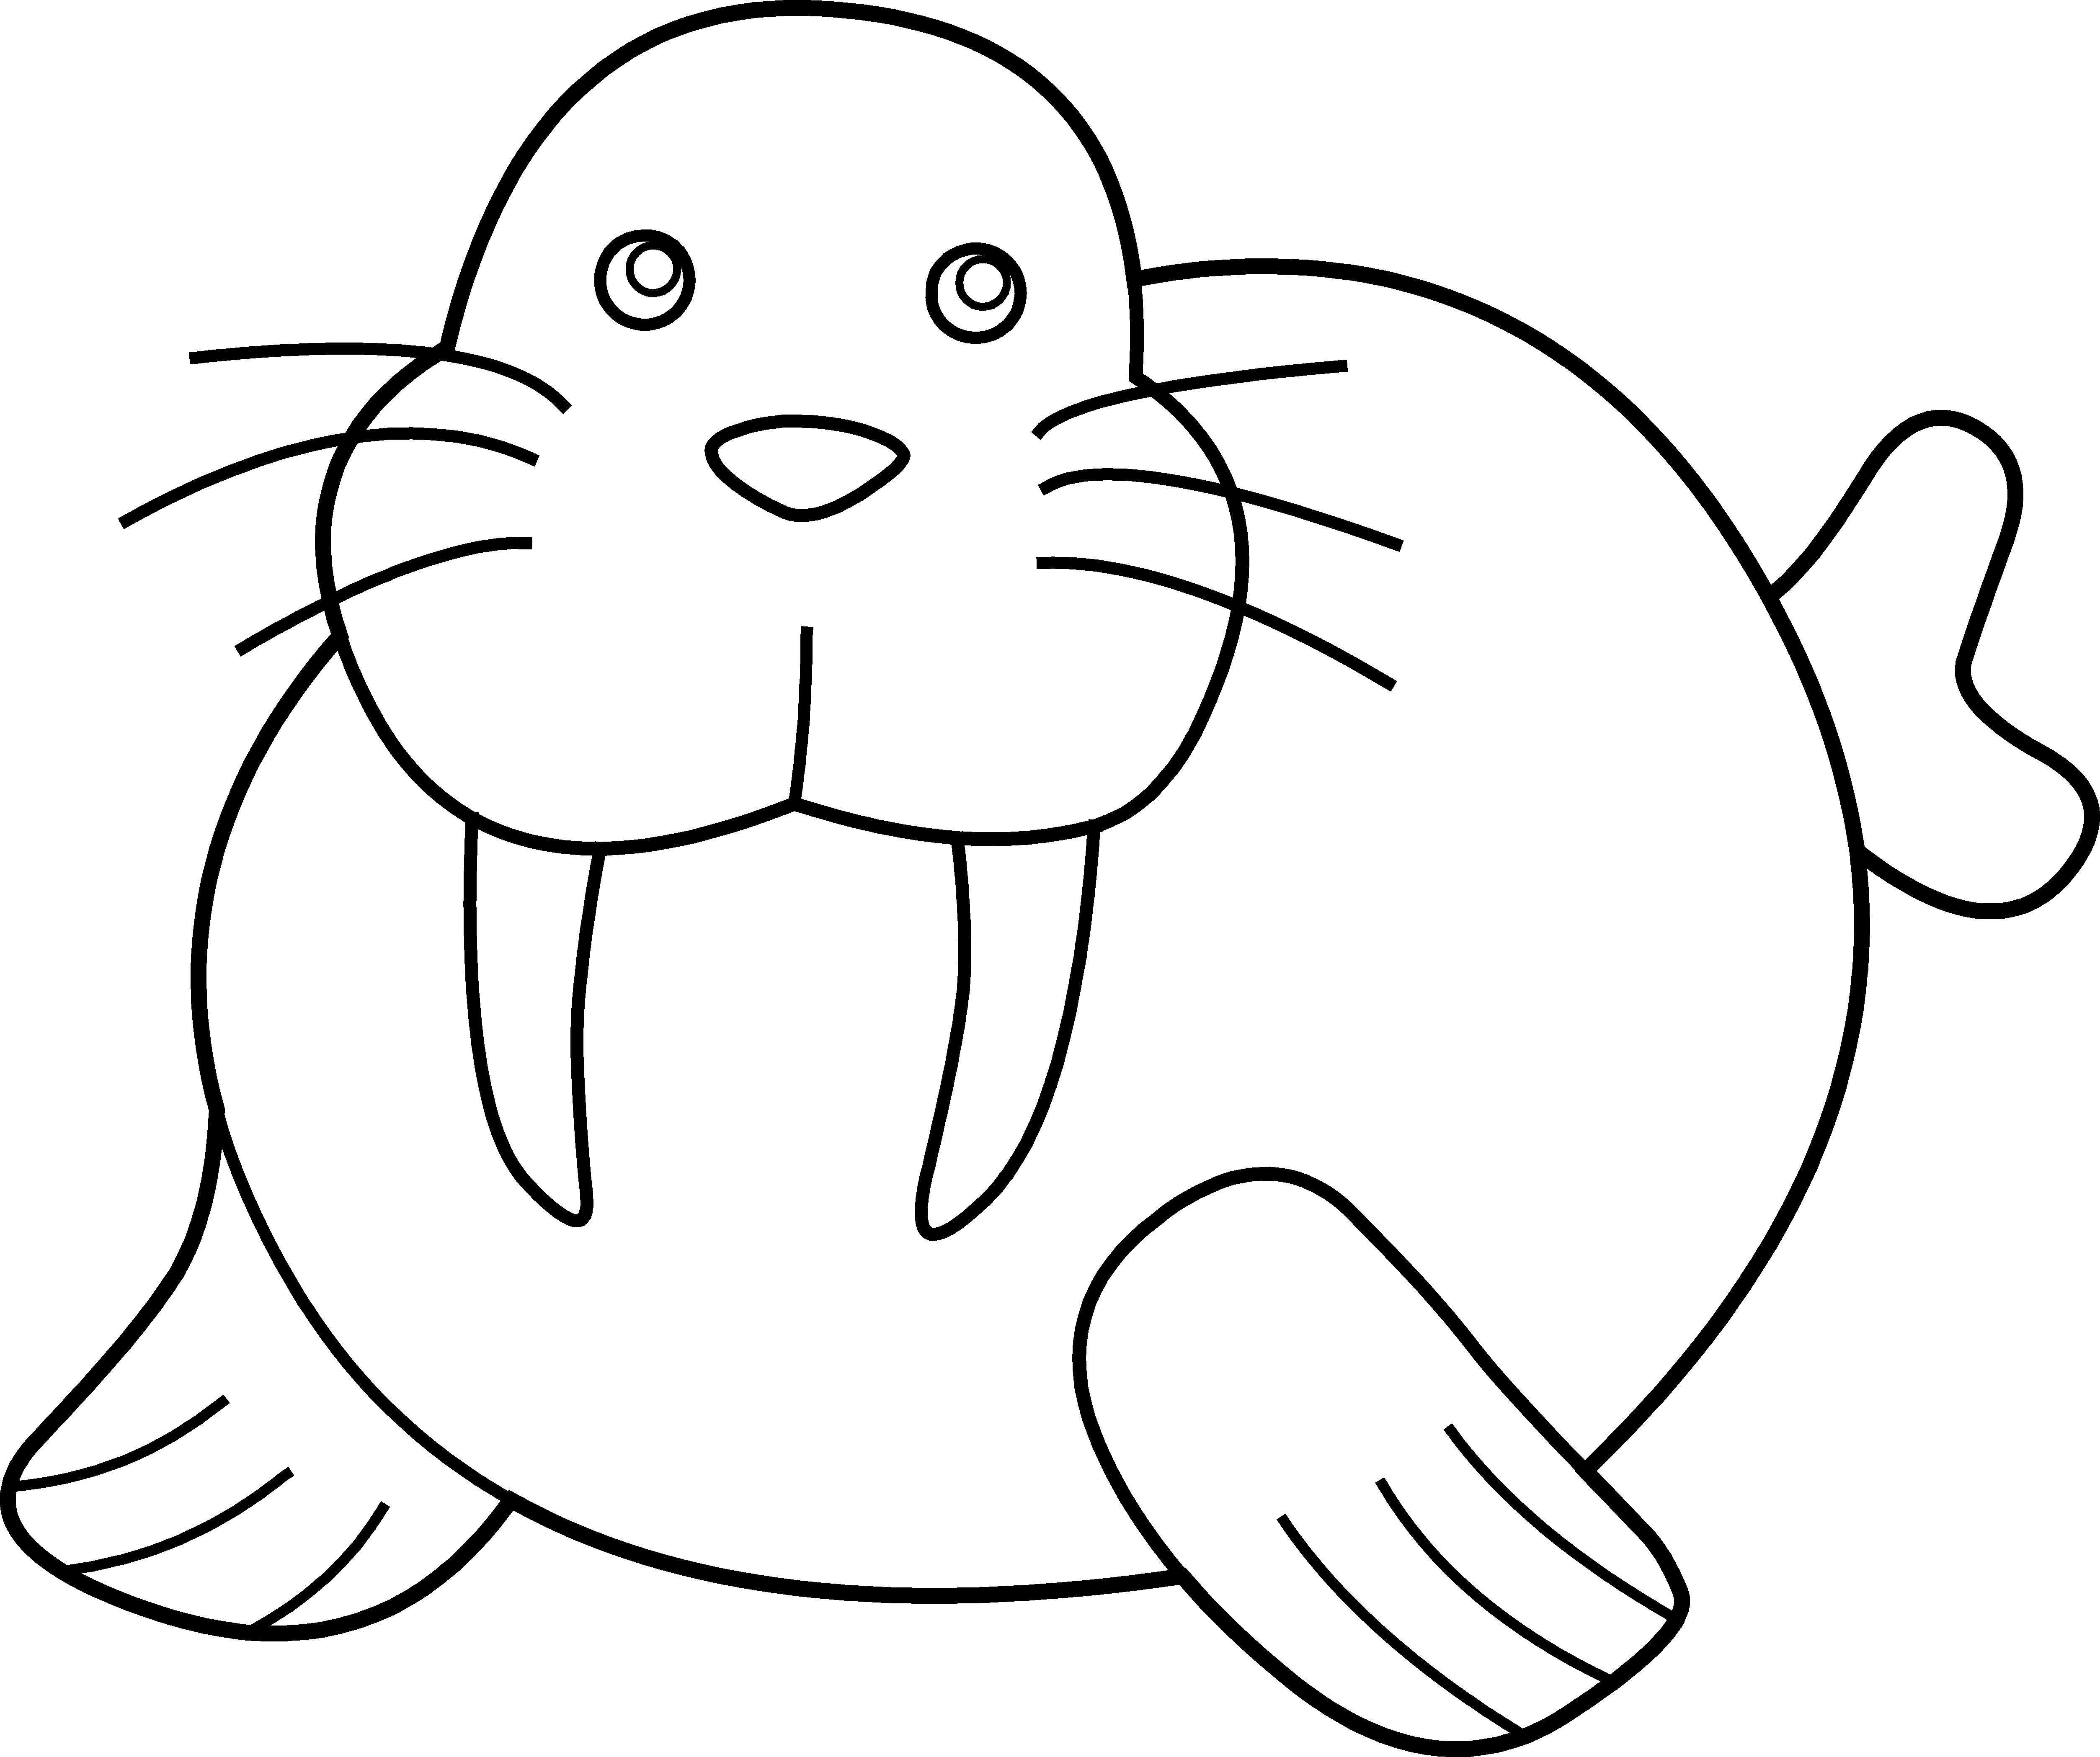 vector transparent download Recess clip art panda. Seal clipart black and white